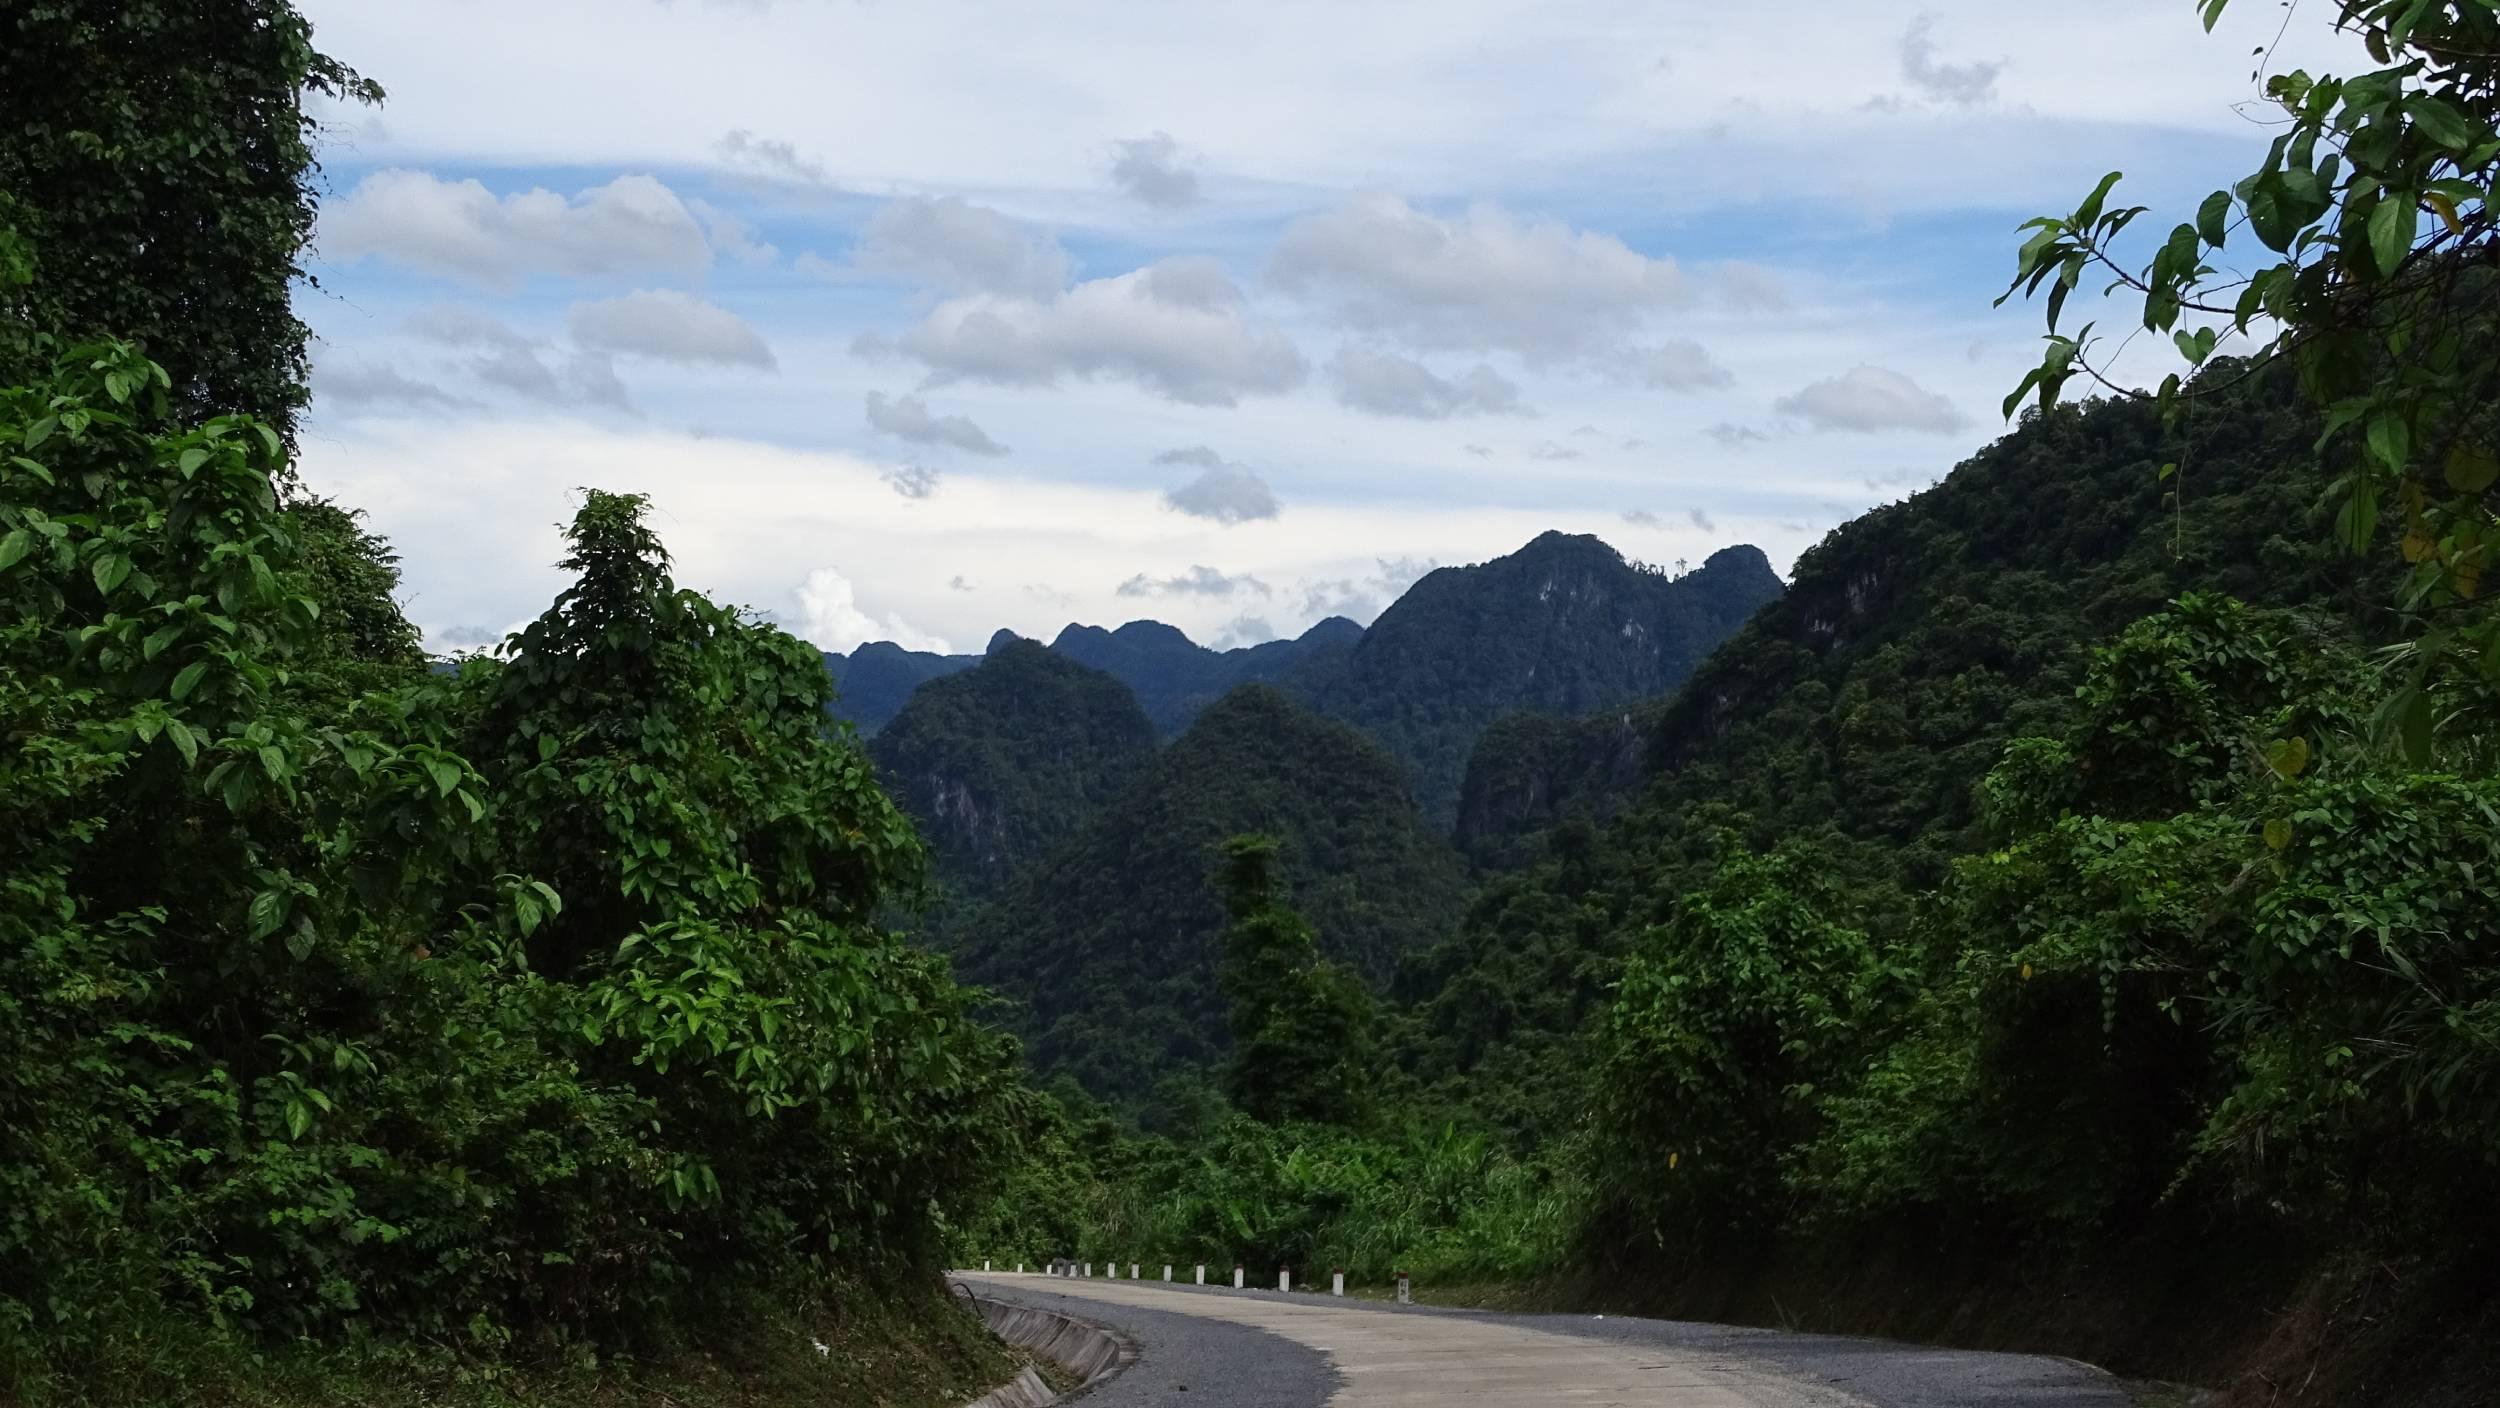 Comb shaped rocks  covered in greenery in Phong Nha Ke Bang National Park